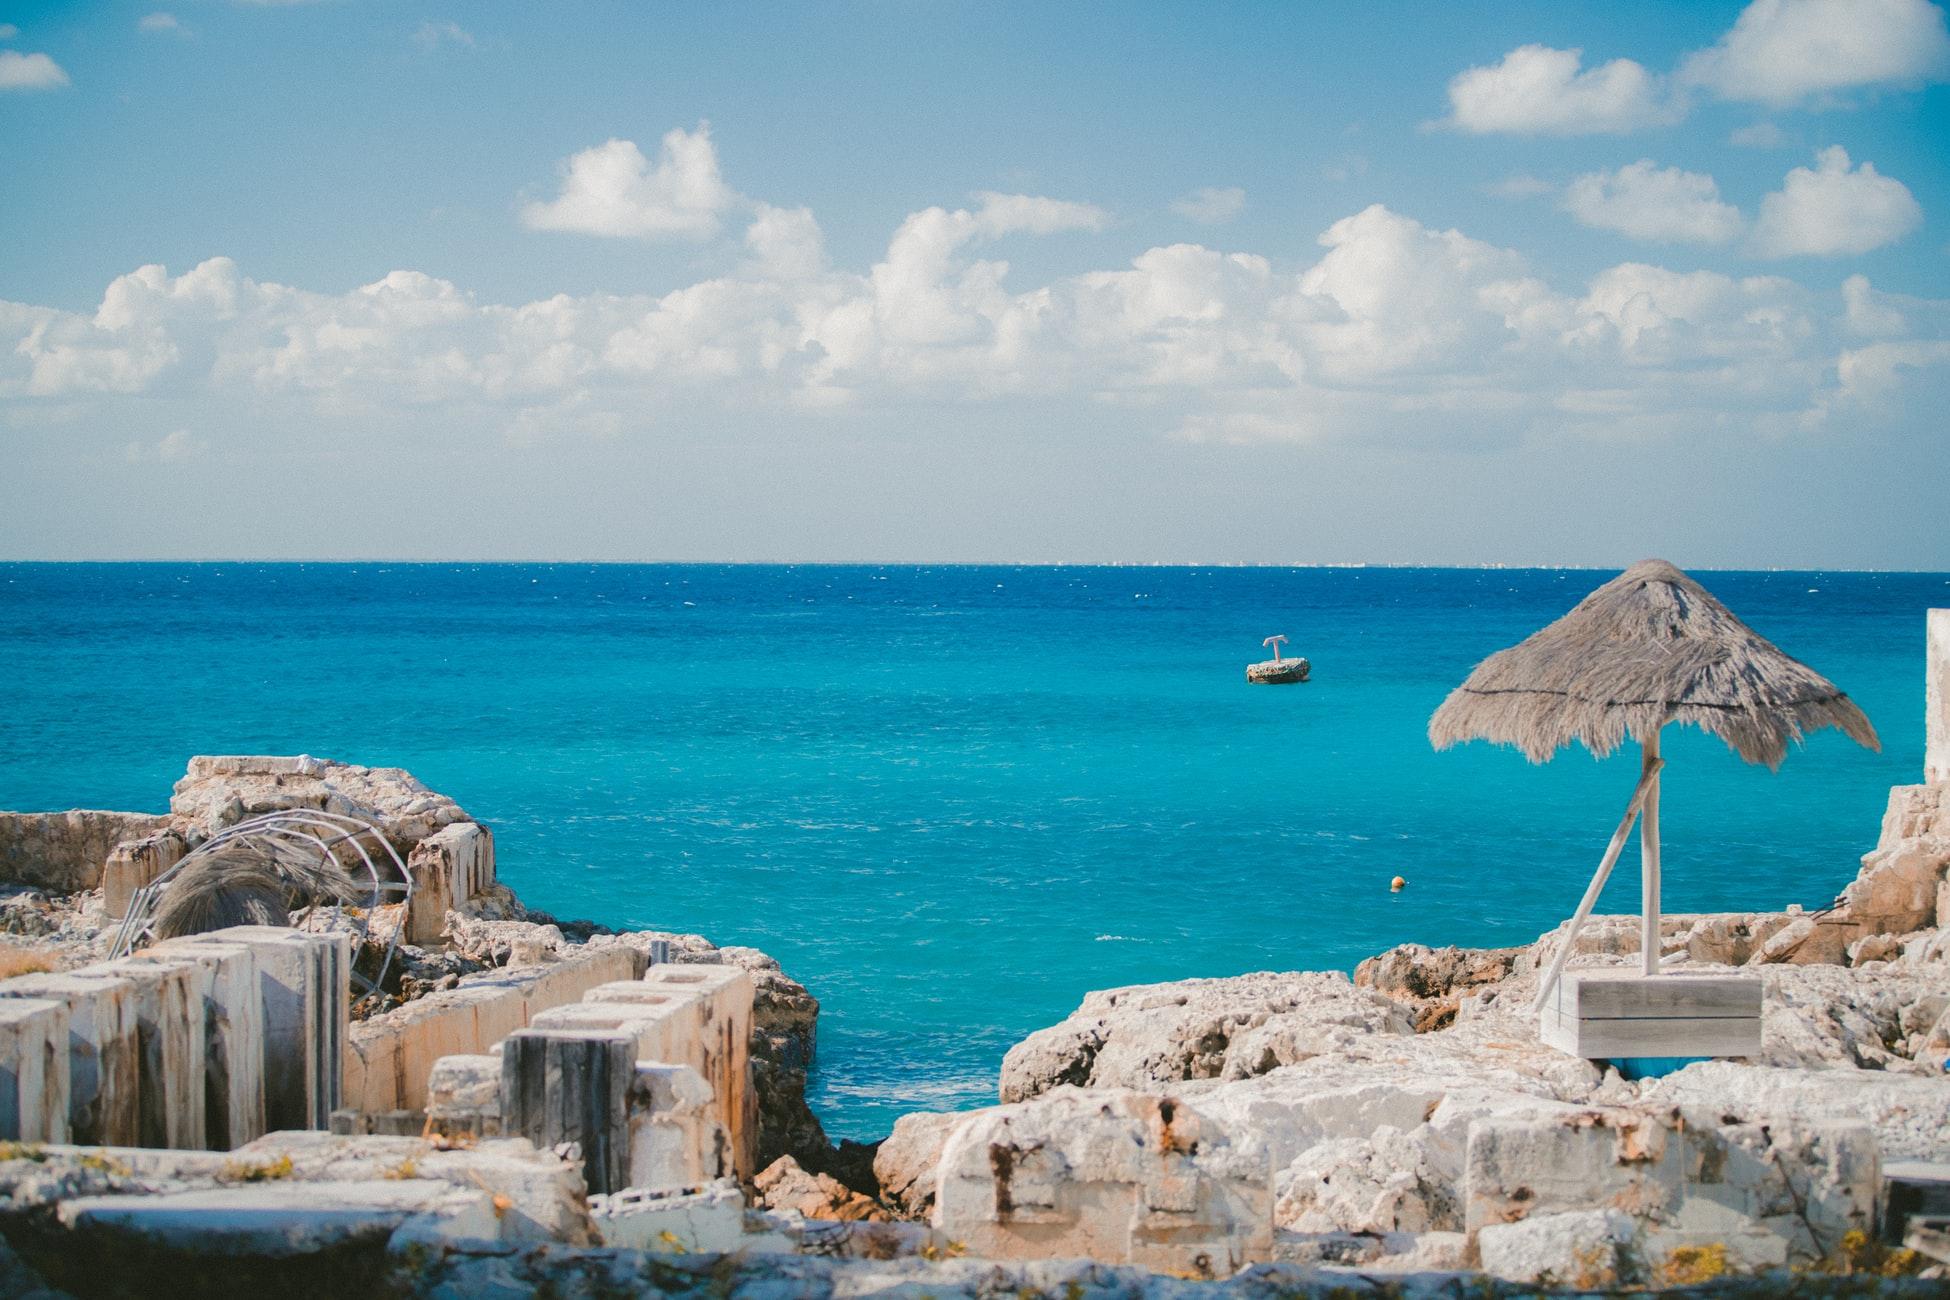 Gulf Coast Mexico Travel Guide